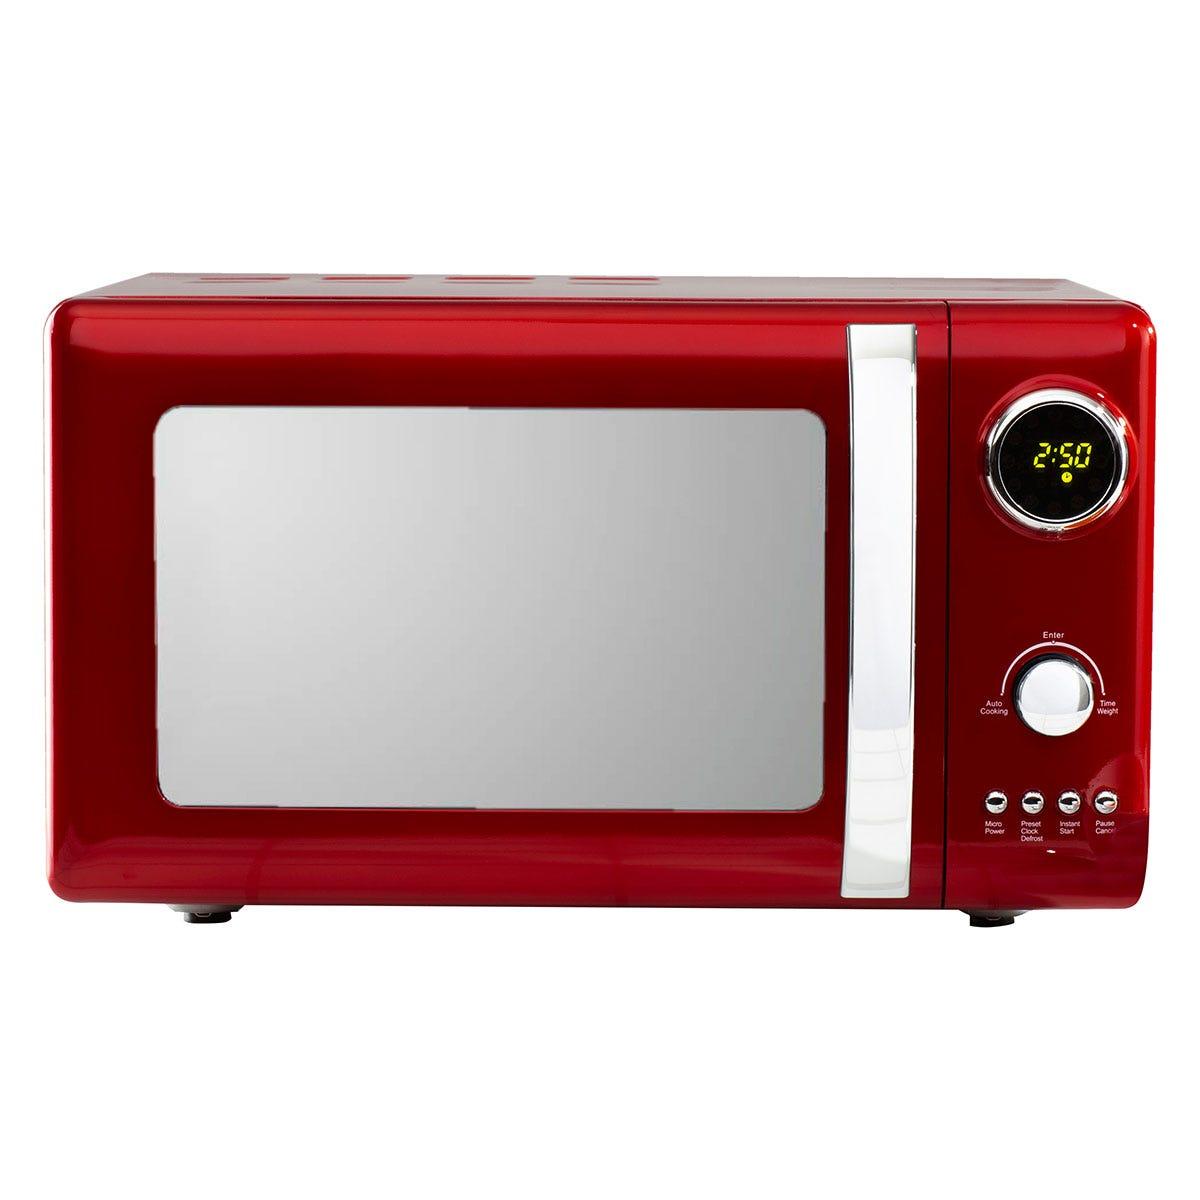 Daewoo SDA1656 800W Kensington 20L Digital Microwave - Red